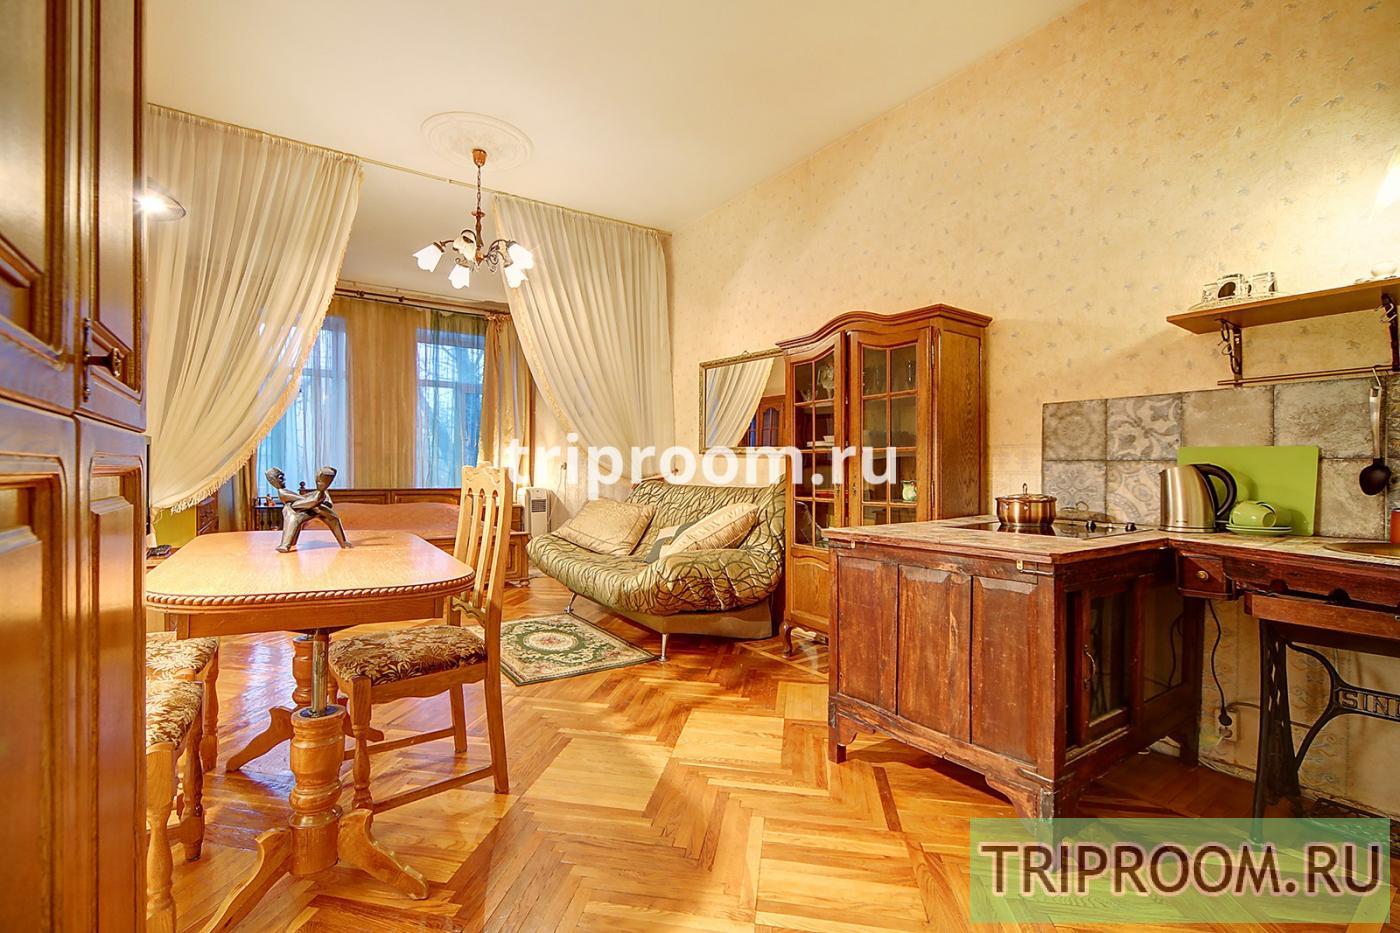 1-комнатная квартира посуточно (вариант № 15445), ул. Лиговский проспект, фото № 11